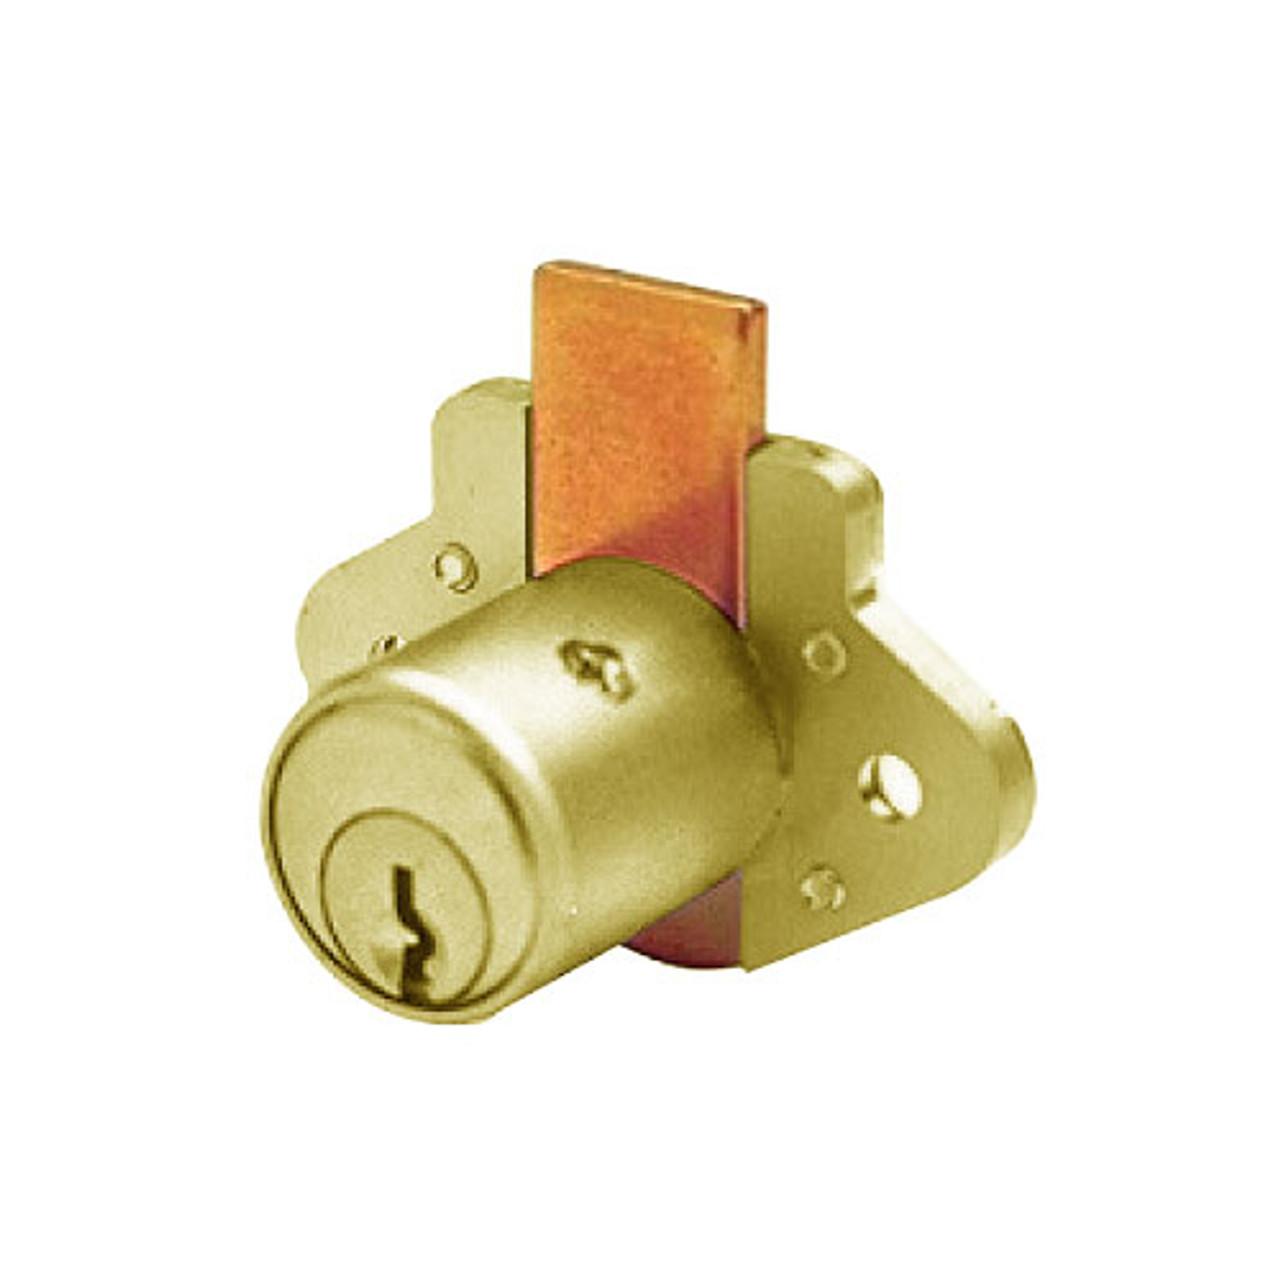 Olympus R078-KD-US4 Cabinet Lock Diamond Back Drawer Lock in Satin Brass Finish